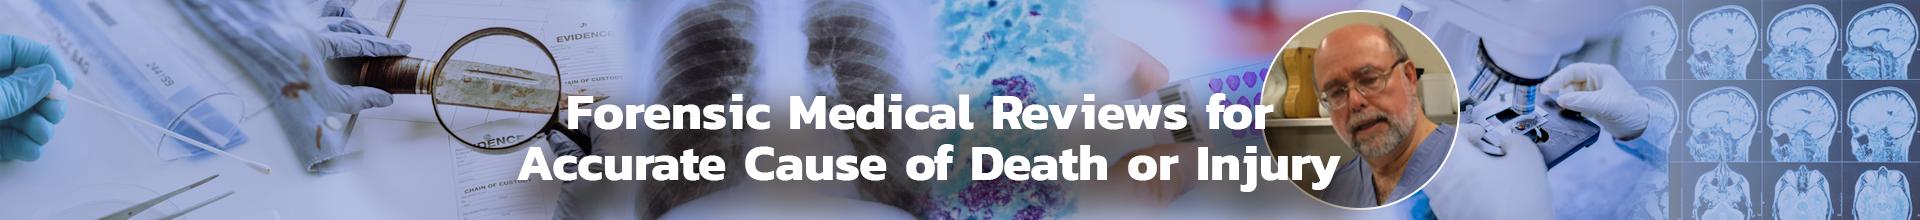 Forensic medico-legal reviews